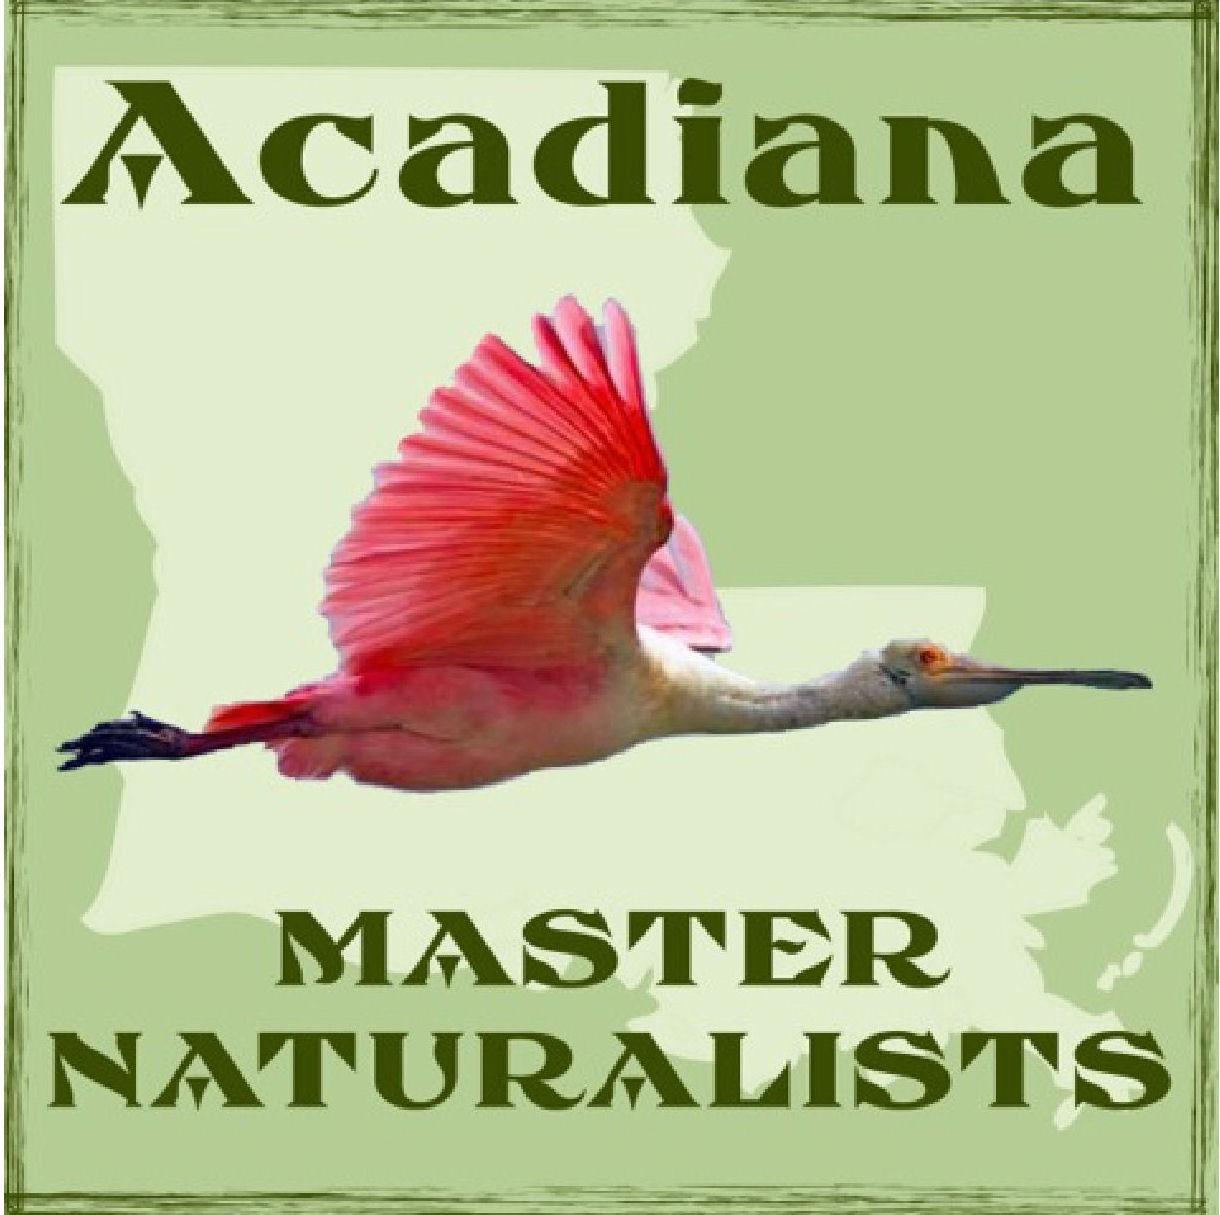 Acadiana Master Naturalists